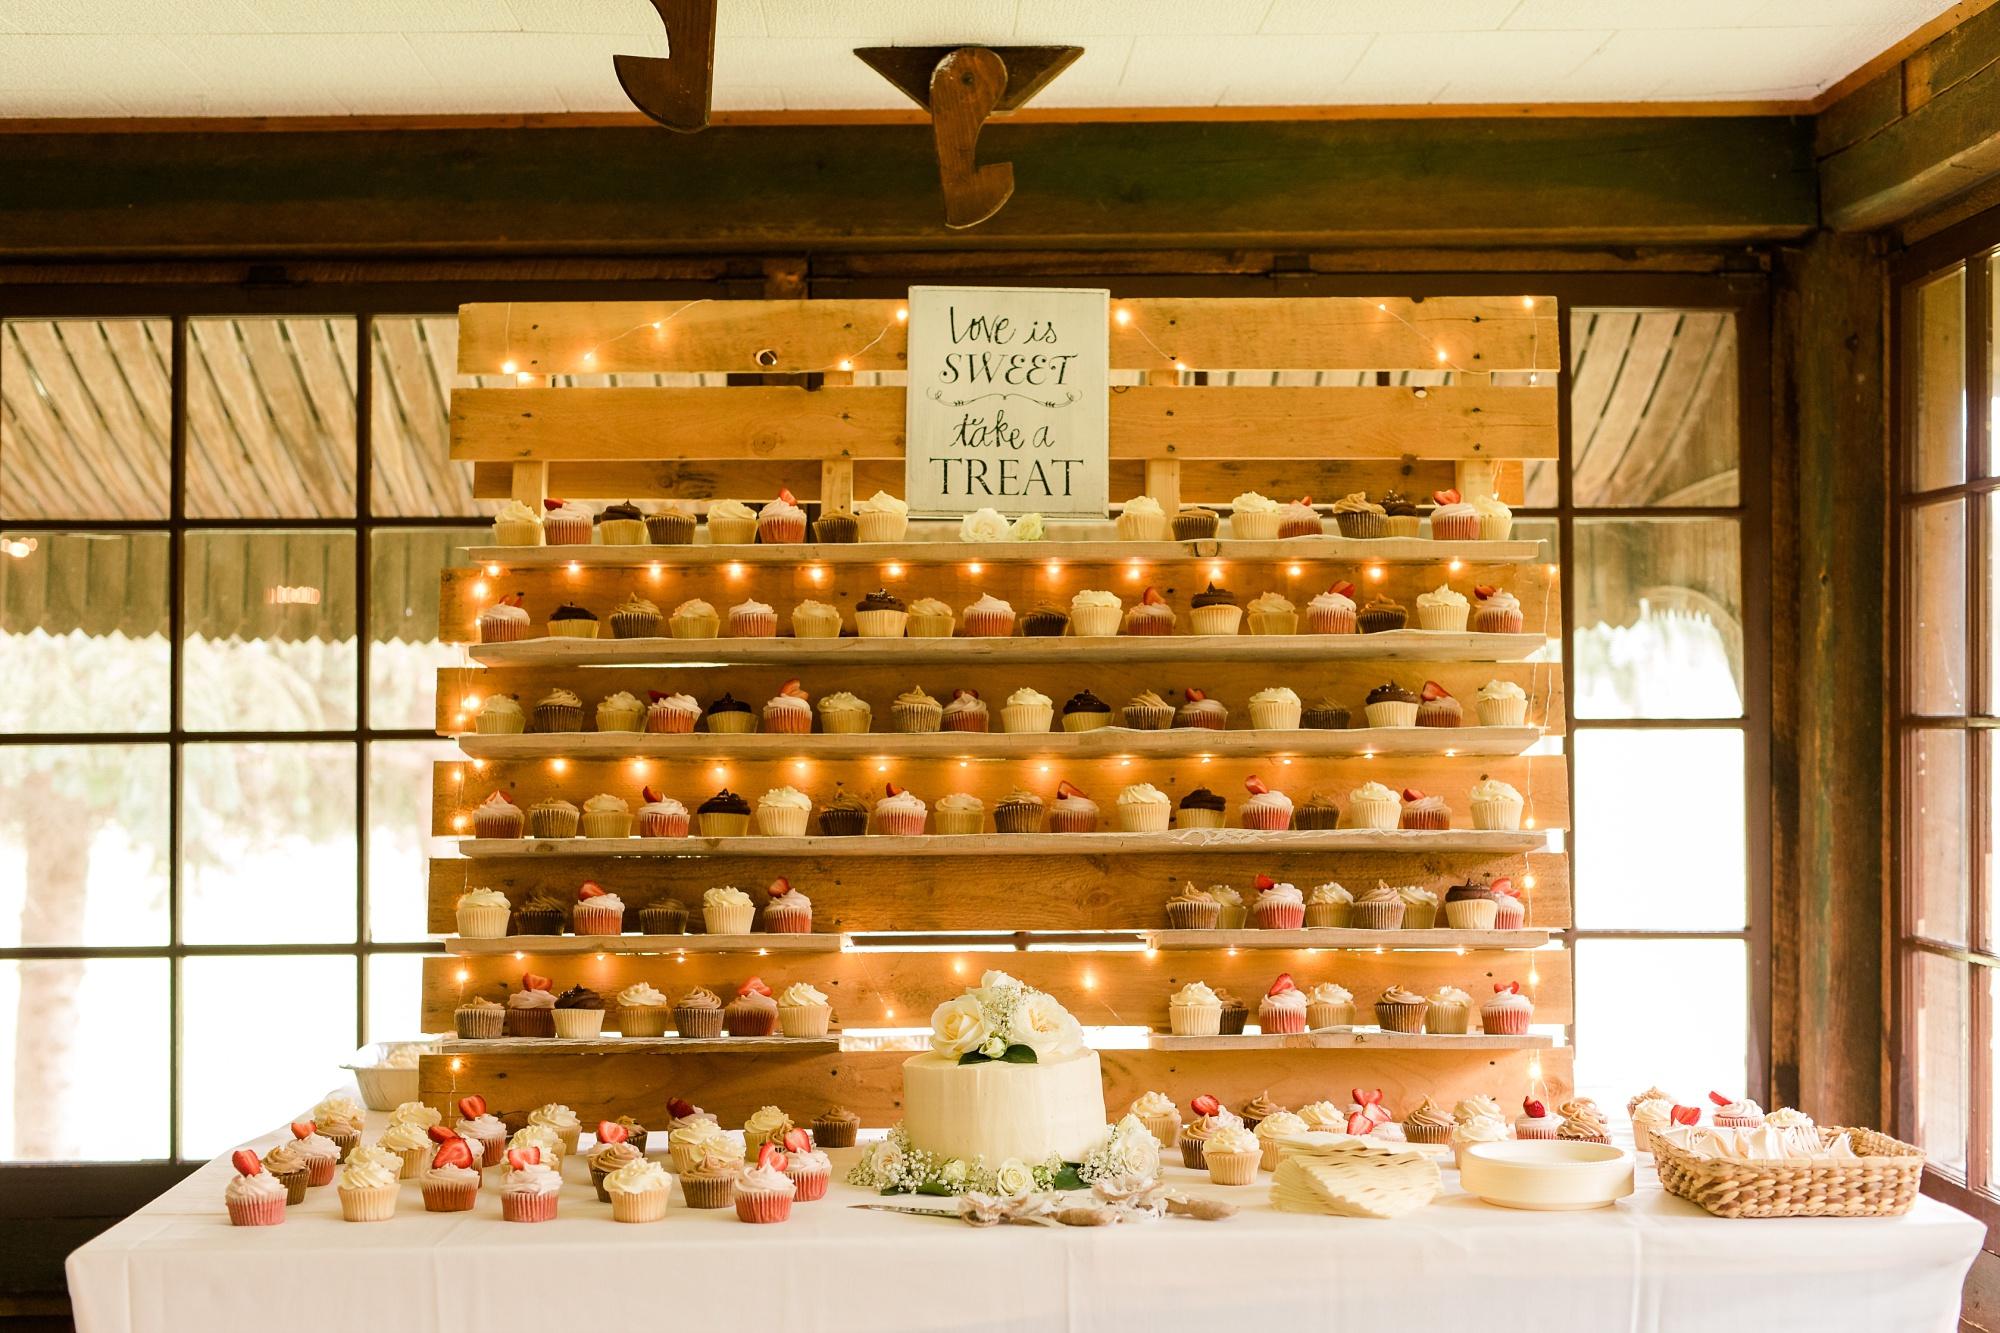 AmberLangerudPhotography_Fair Hills Resort Lakeside Wedding in Minnesota_3481.jpg